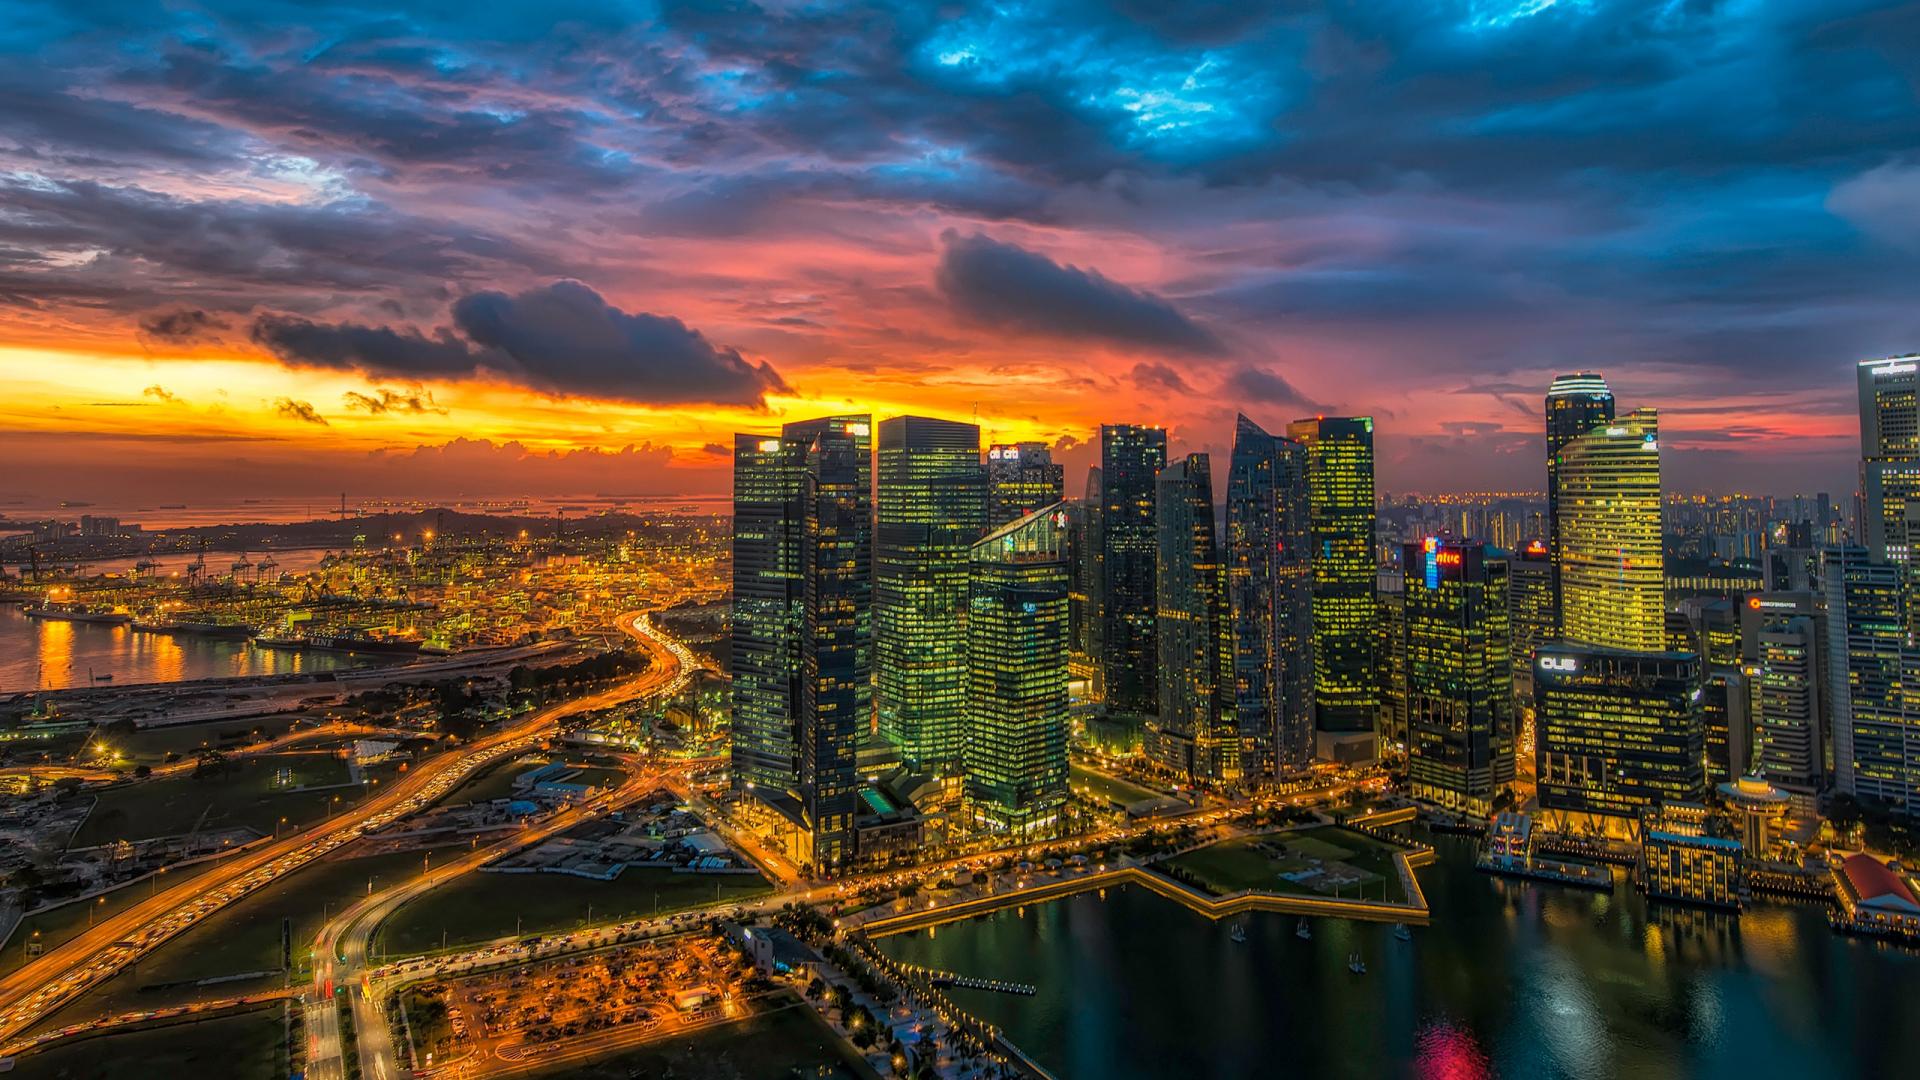 Free download Glowing Singapore 219 Wallpaper Ultrawide ...